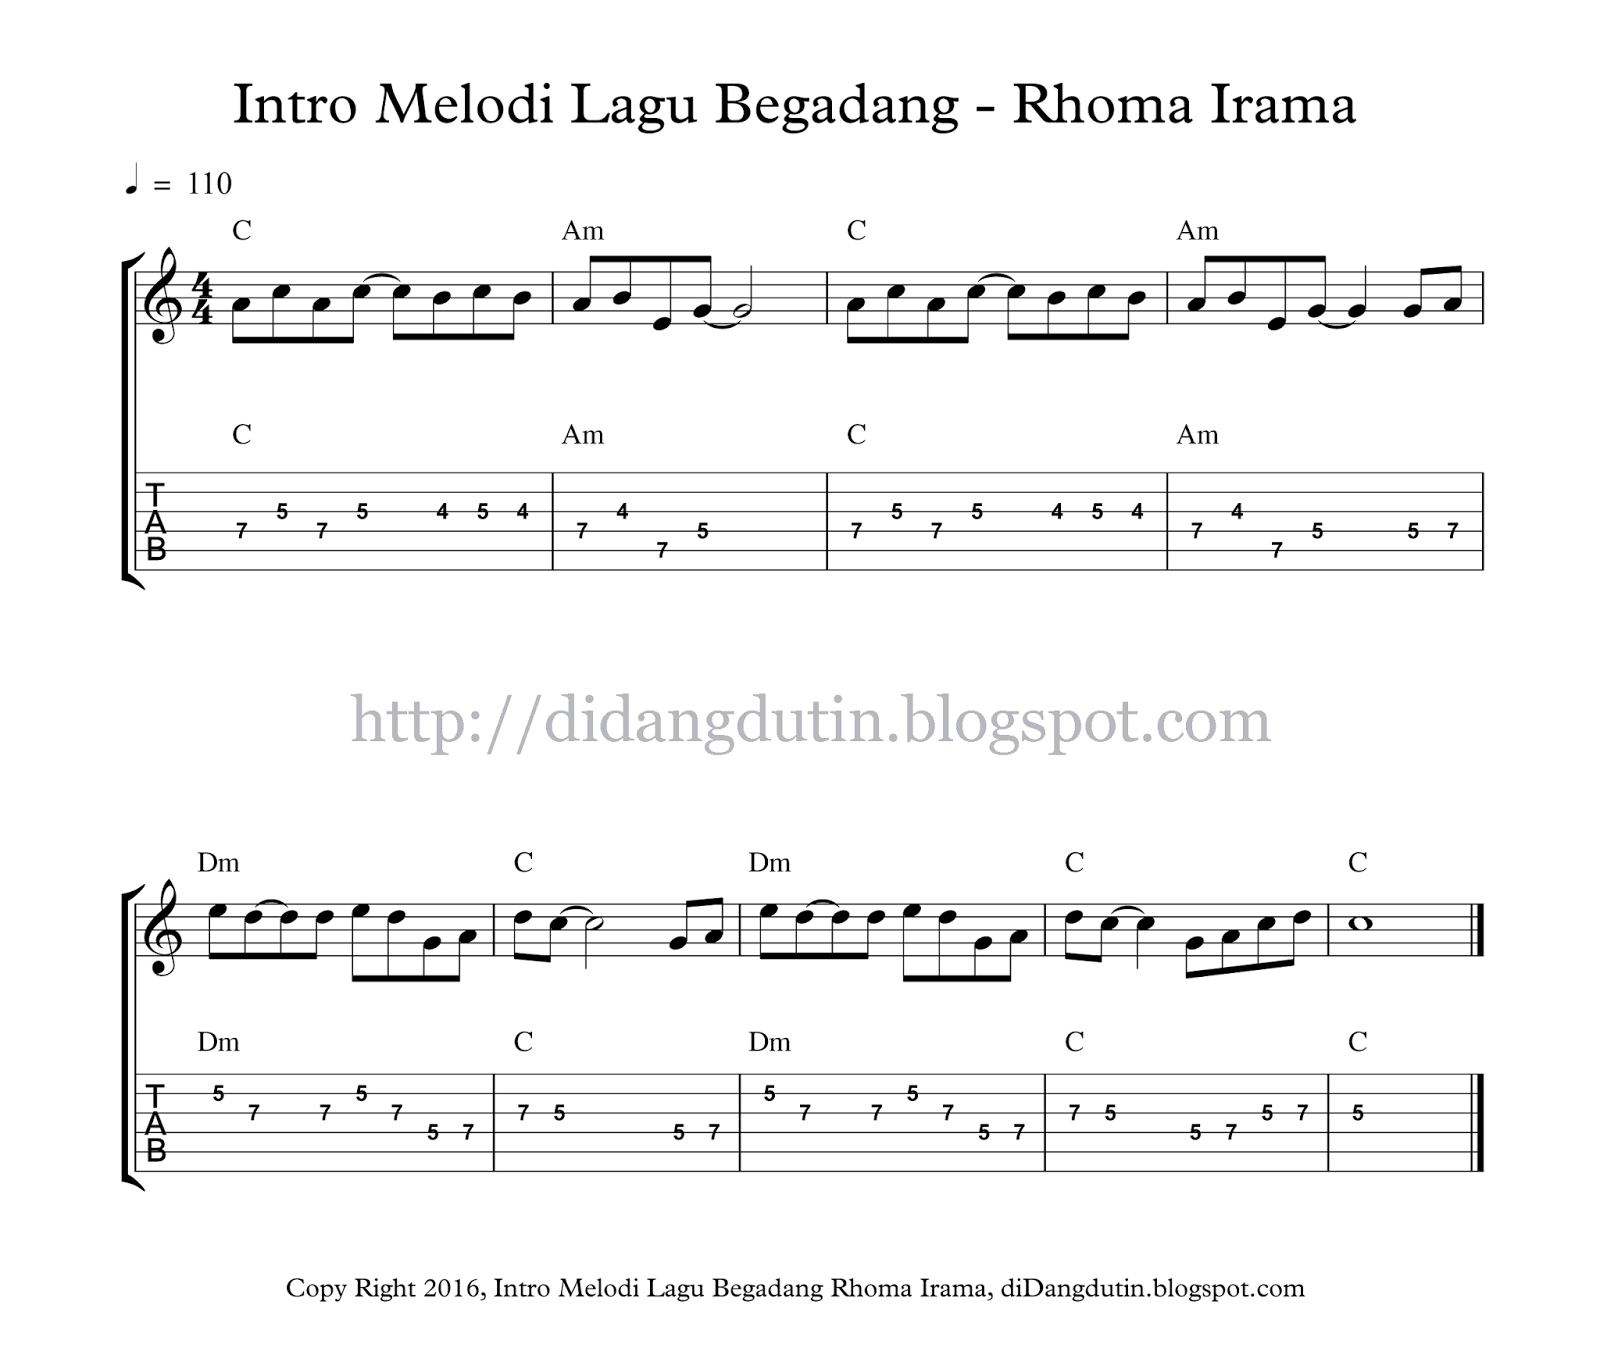 Intro Melodi Tab Dan Not Balok Lagu Begadang Rhoma Irama Didangdutin